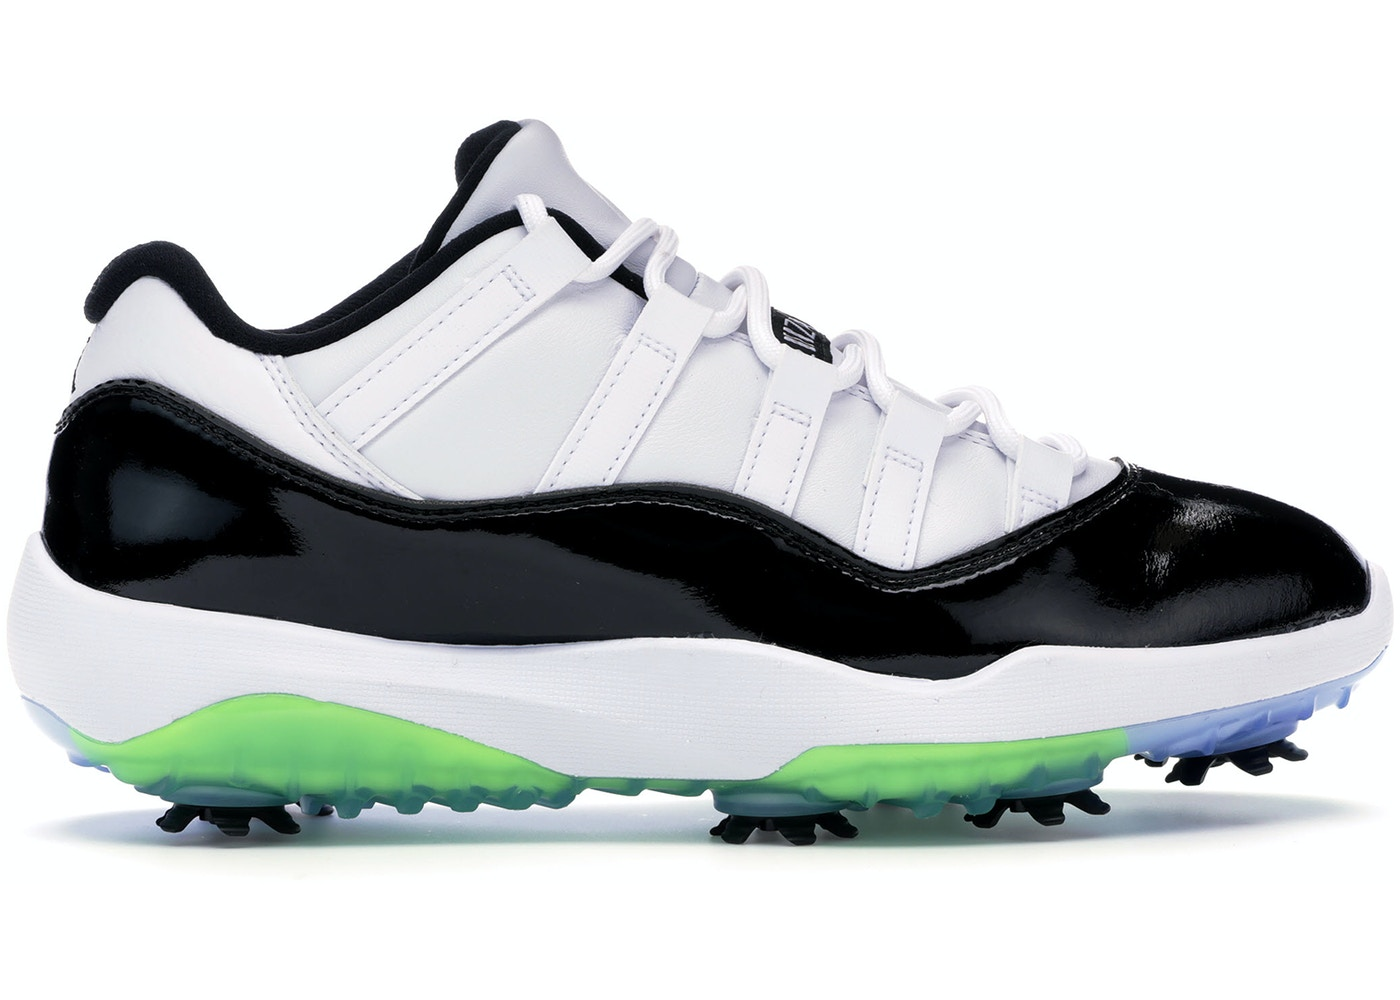 0c1ea9395 Buy Air Jordan 11 Shoes   Deadstock Sneakers